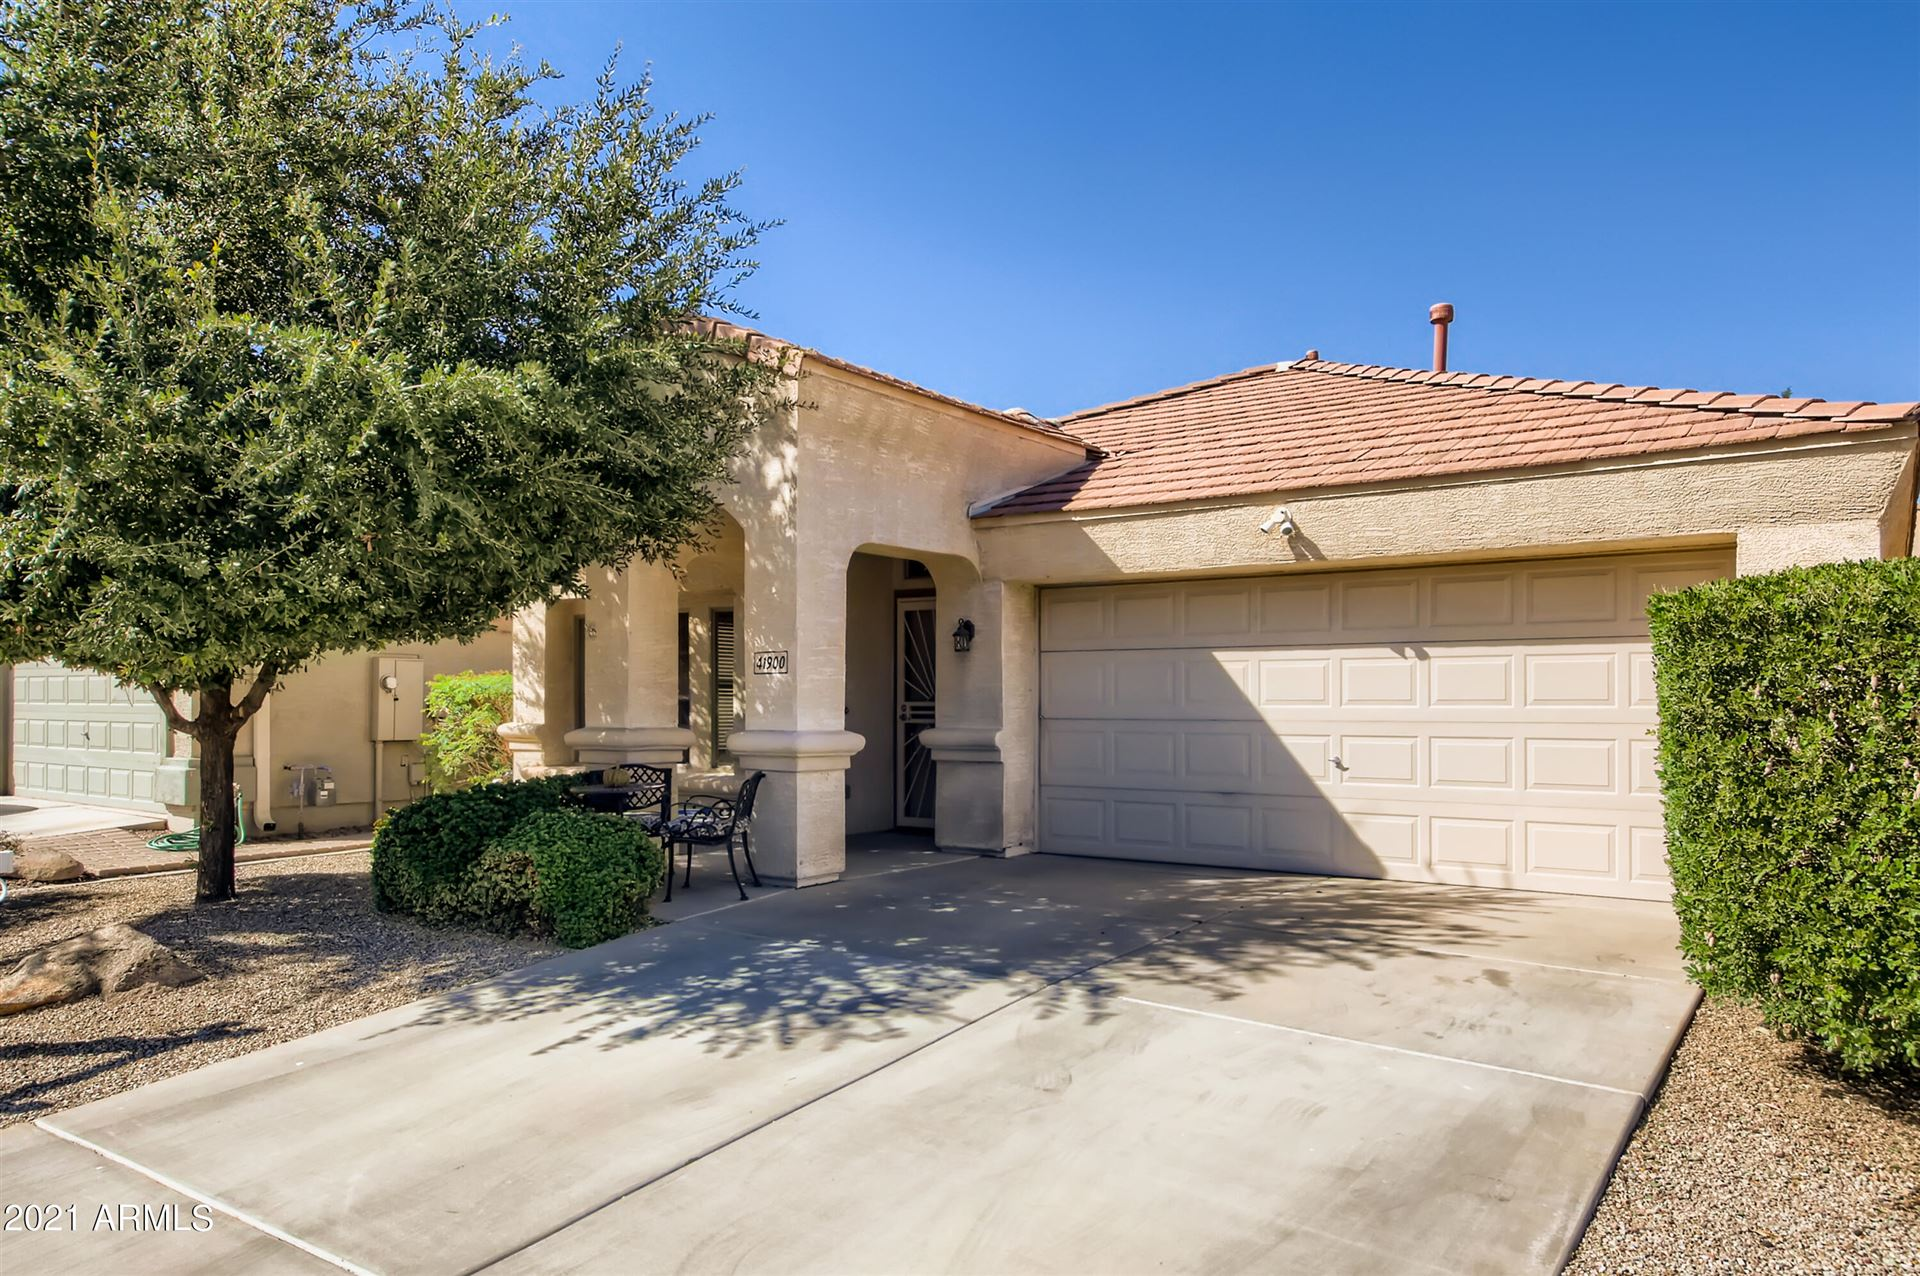 Photo of 41900 W MICHAELS Drive, Maricopa, AZ 85138 (MLS # 6307599)